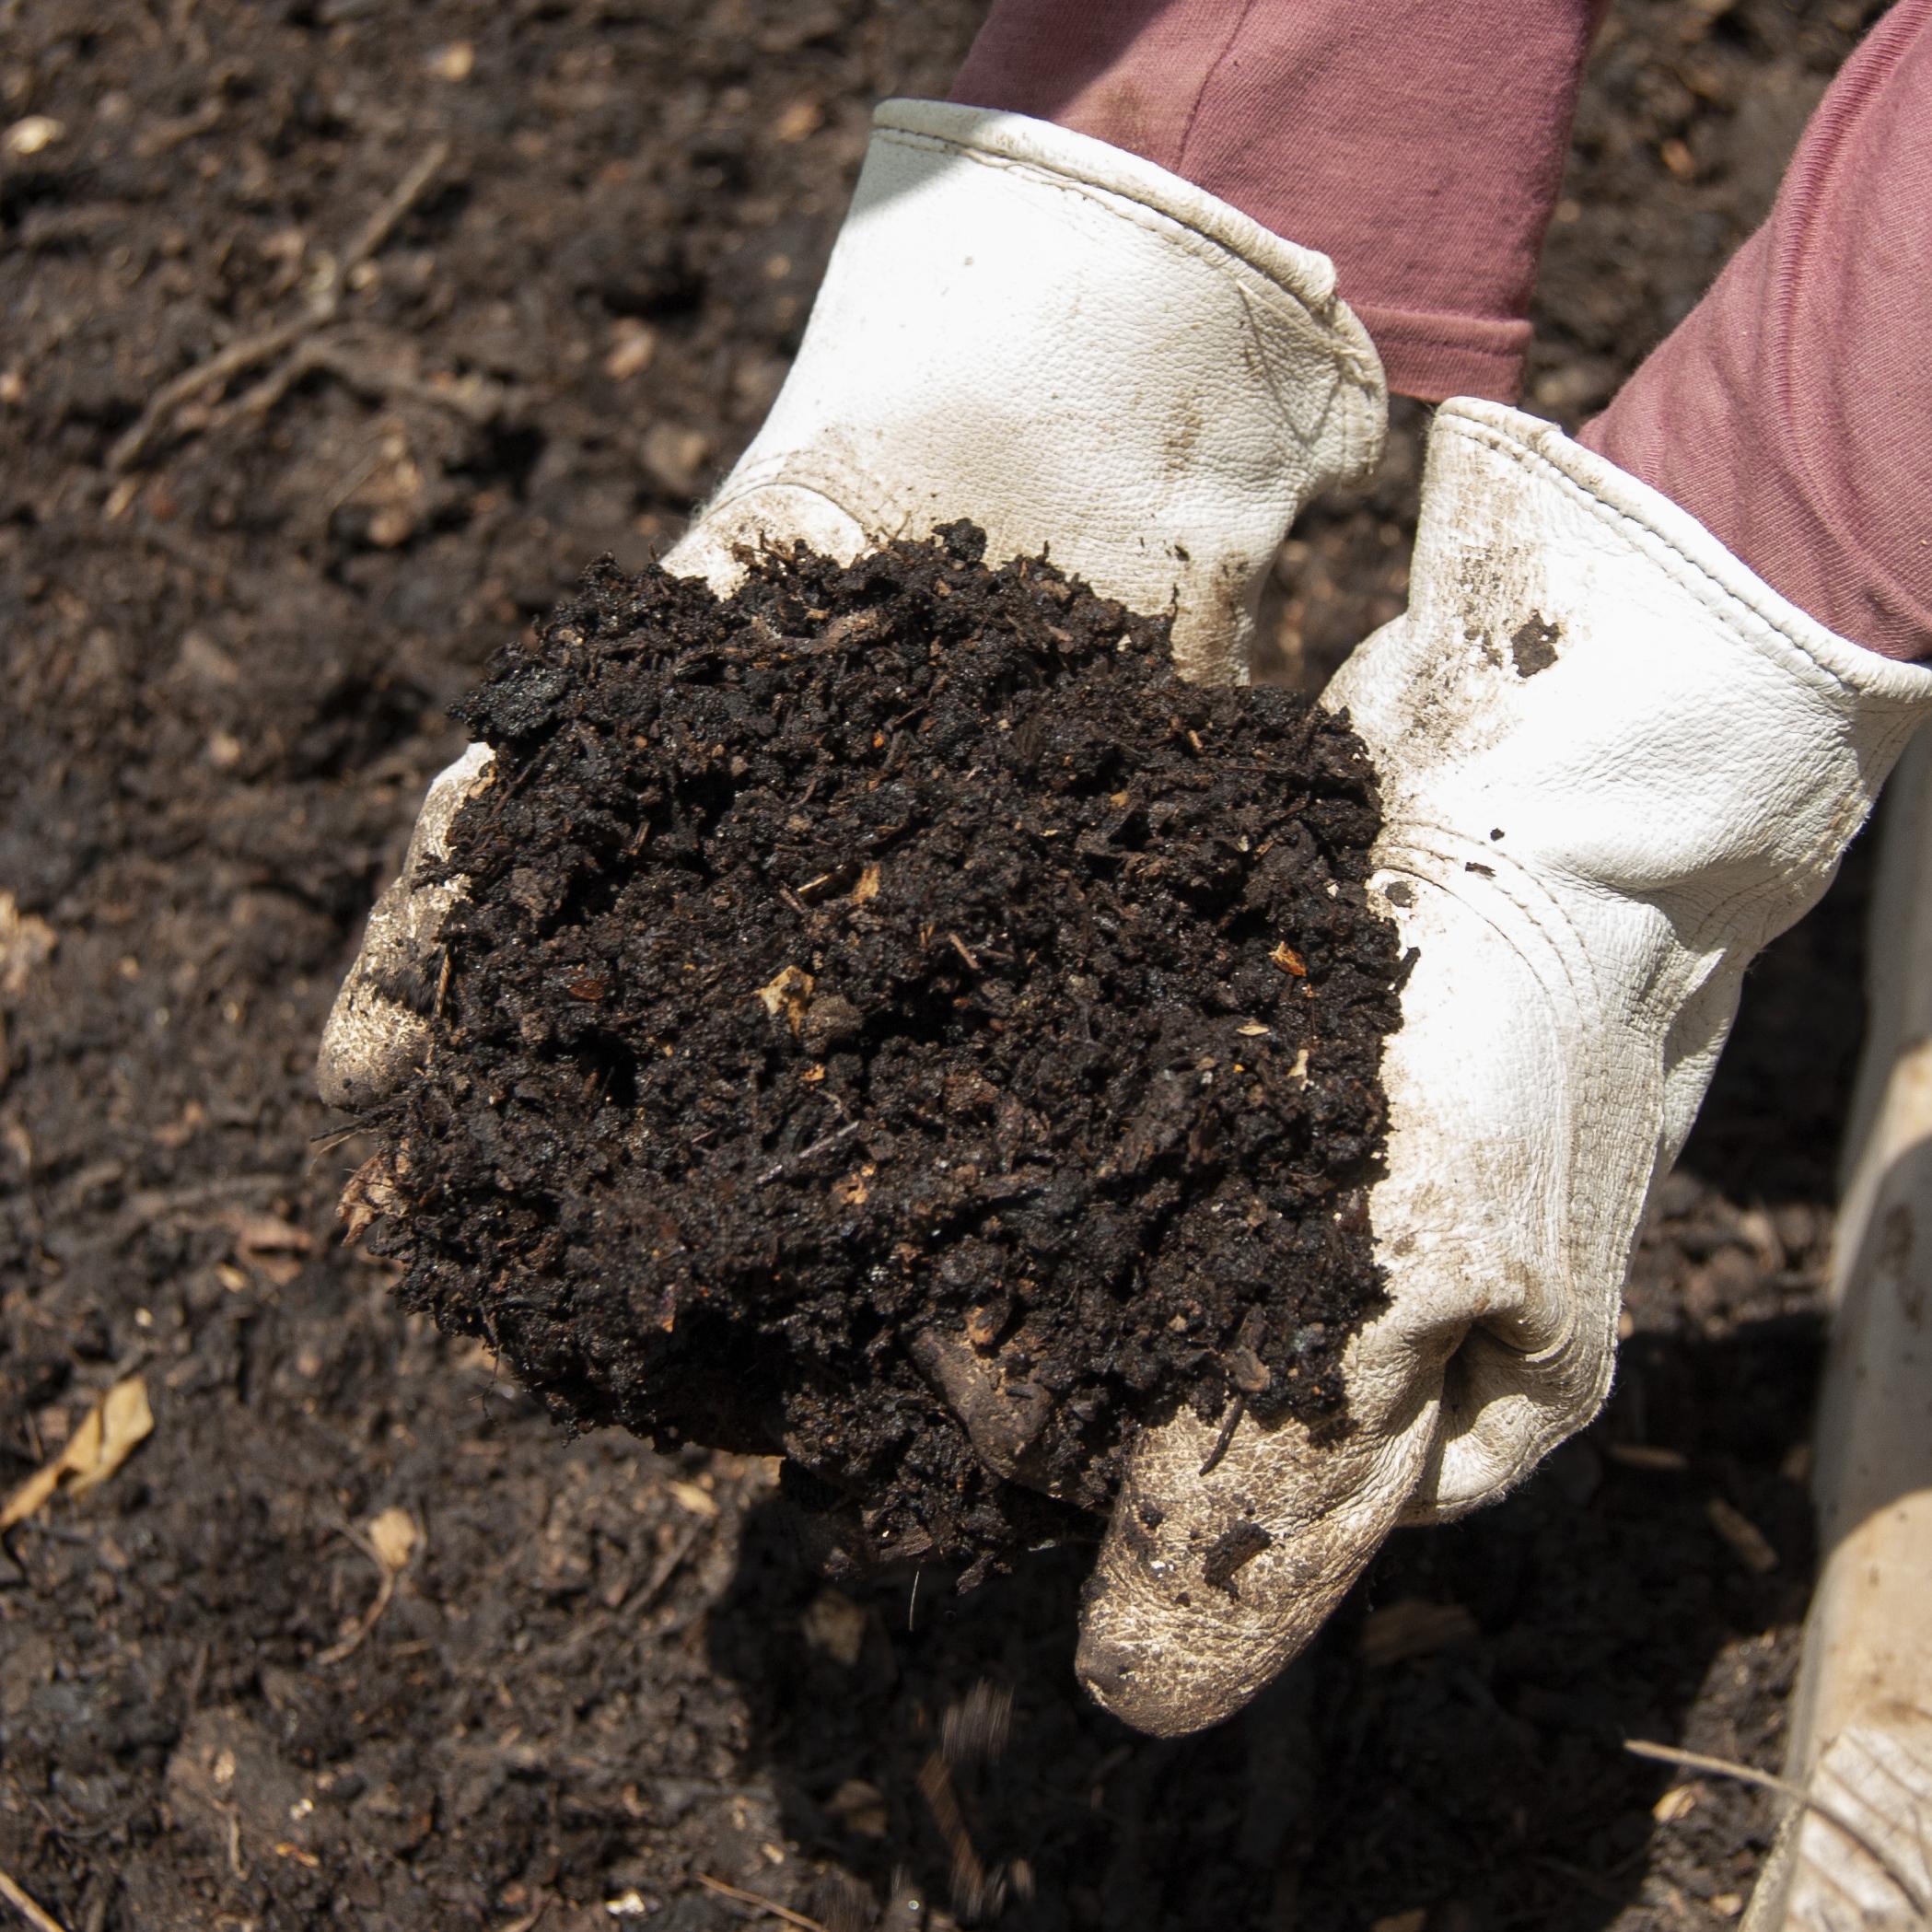 Composting Education